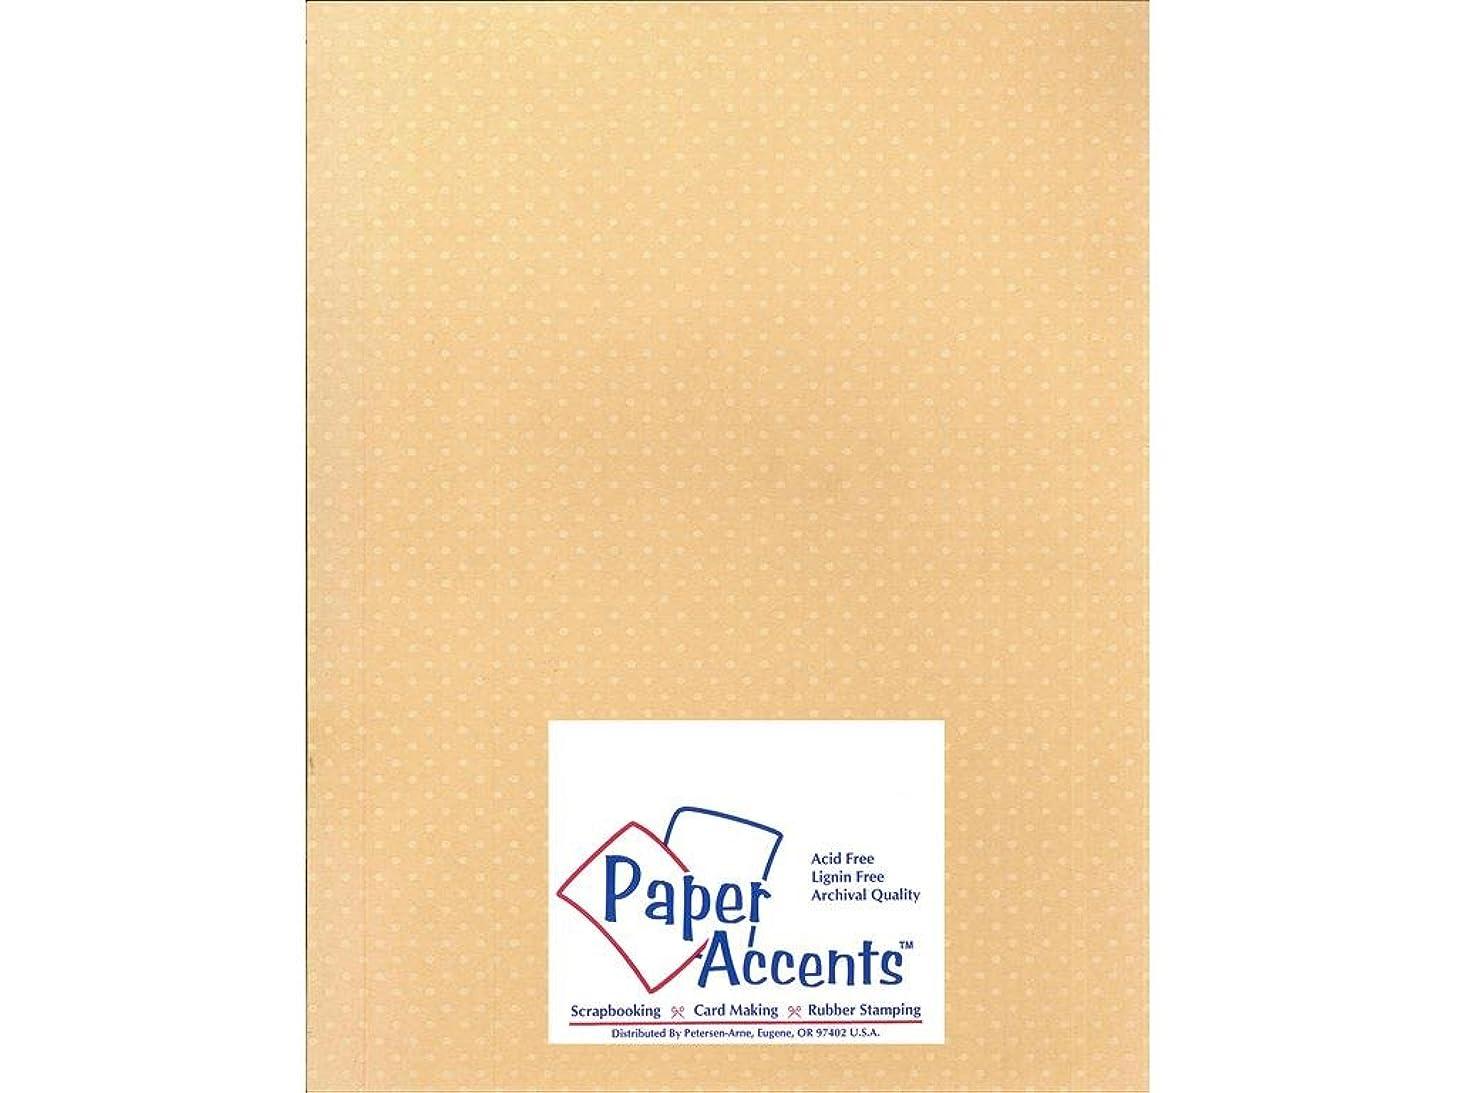 Accent Design Paper Accents Cdstk Mini Dots 8.5x11 80# Cotton Grass